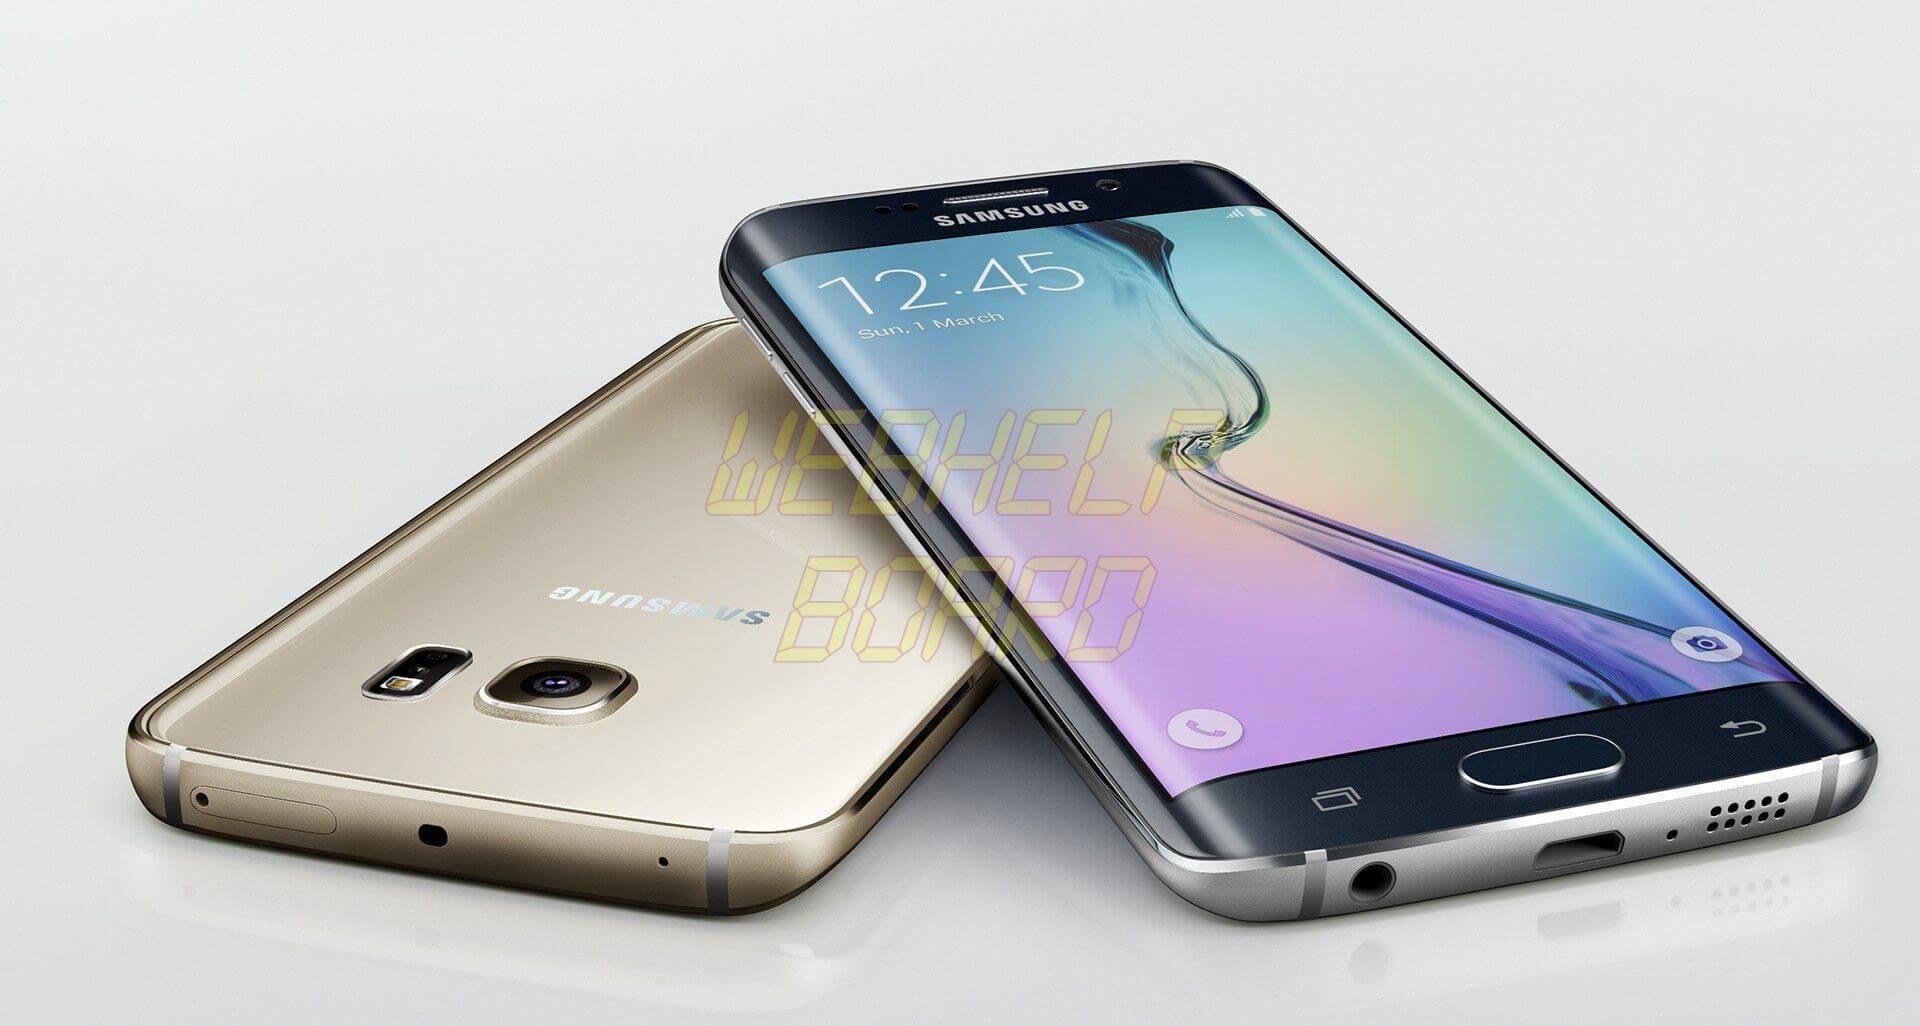 samsung kills galaxy s7 edge plus following fans backlash 500024 2 - Tutorial: como ter o Android Nougat agora no Galaxy S7